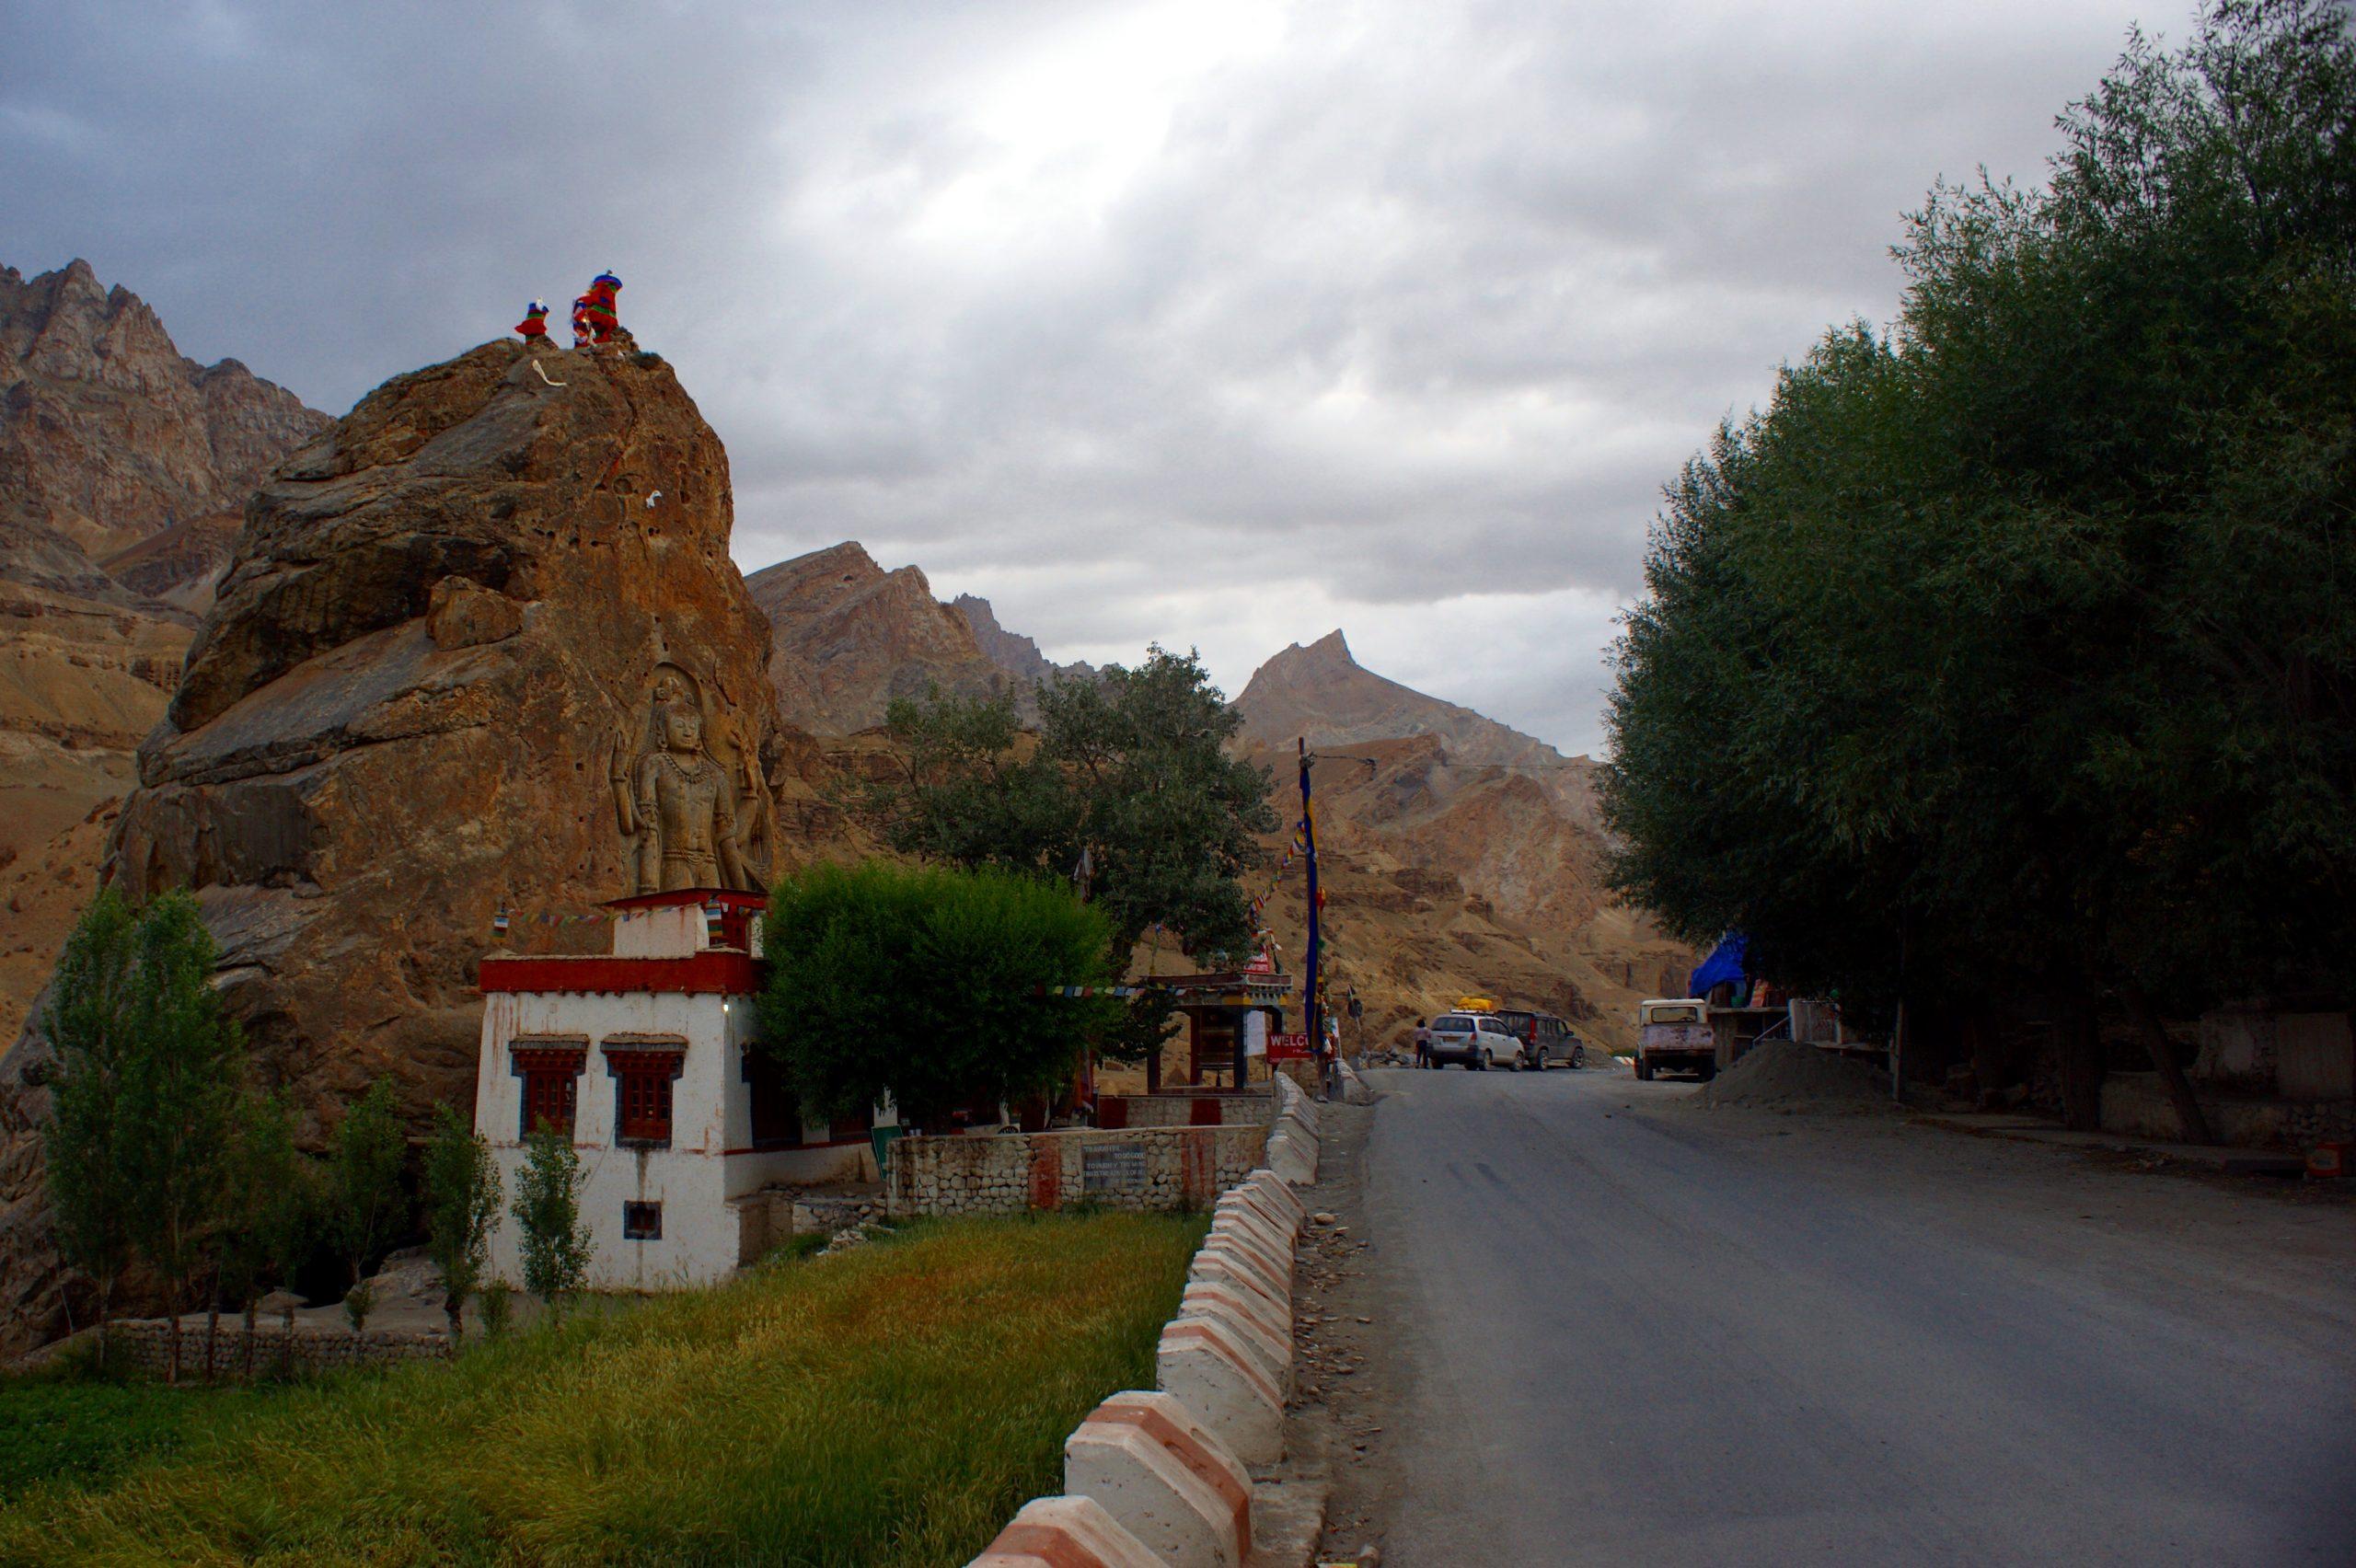 Mulbekh Monastery, Kargil